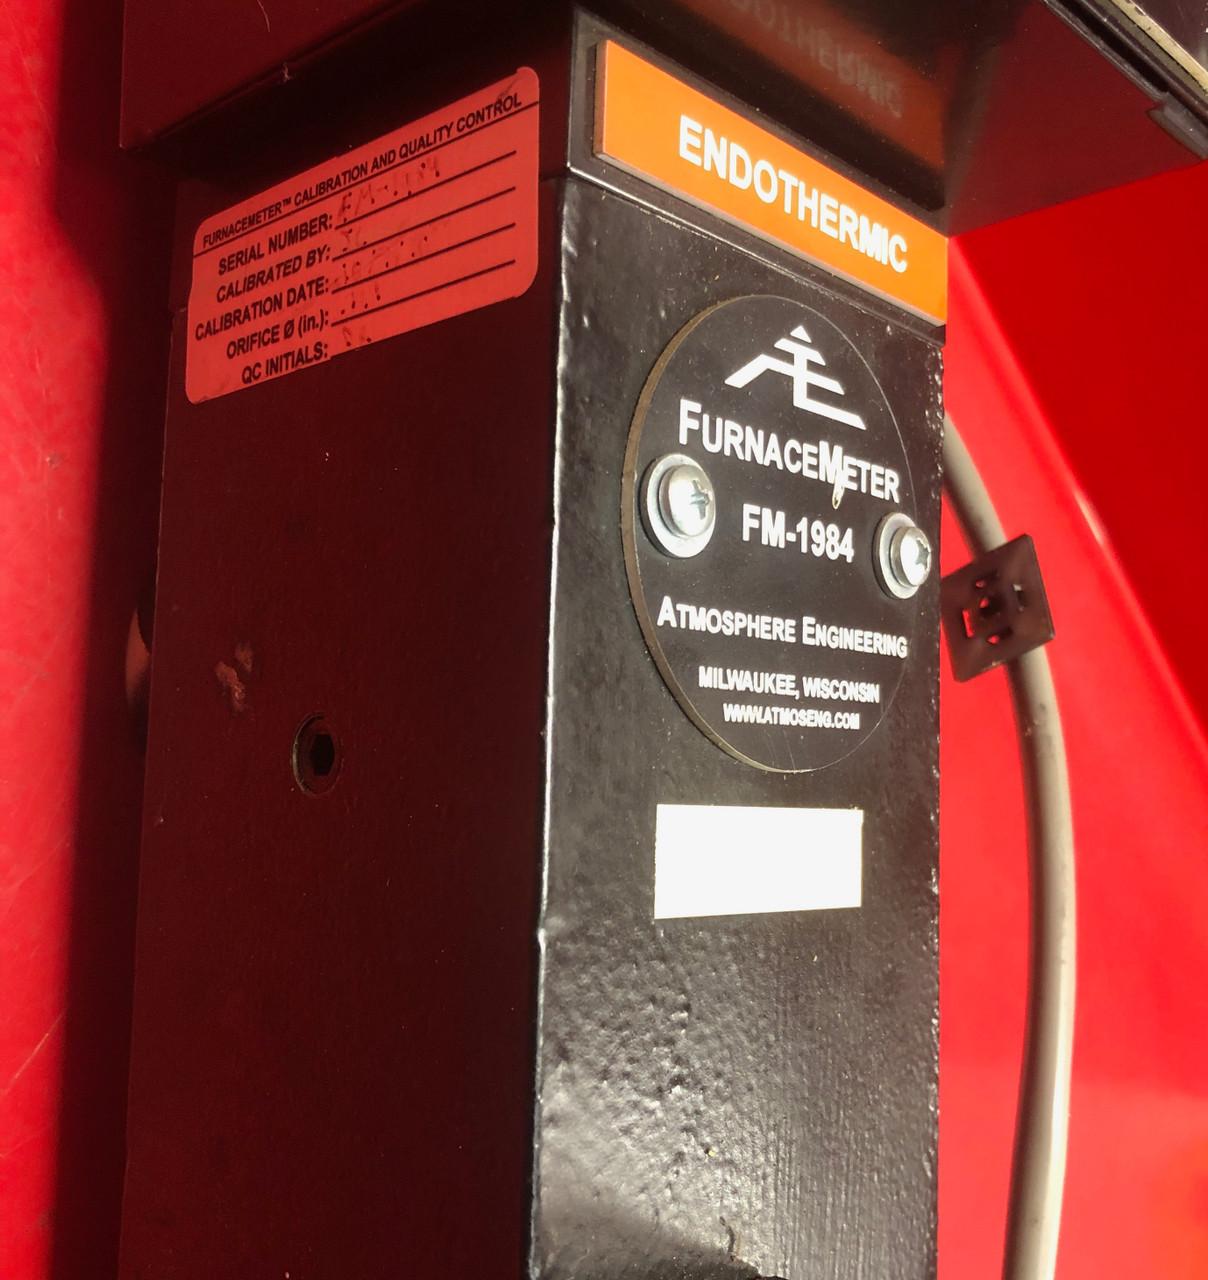 Atmosphere Engineering Electronic FurnaceMeter™ 0-1800 CFH (Endothermic)